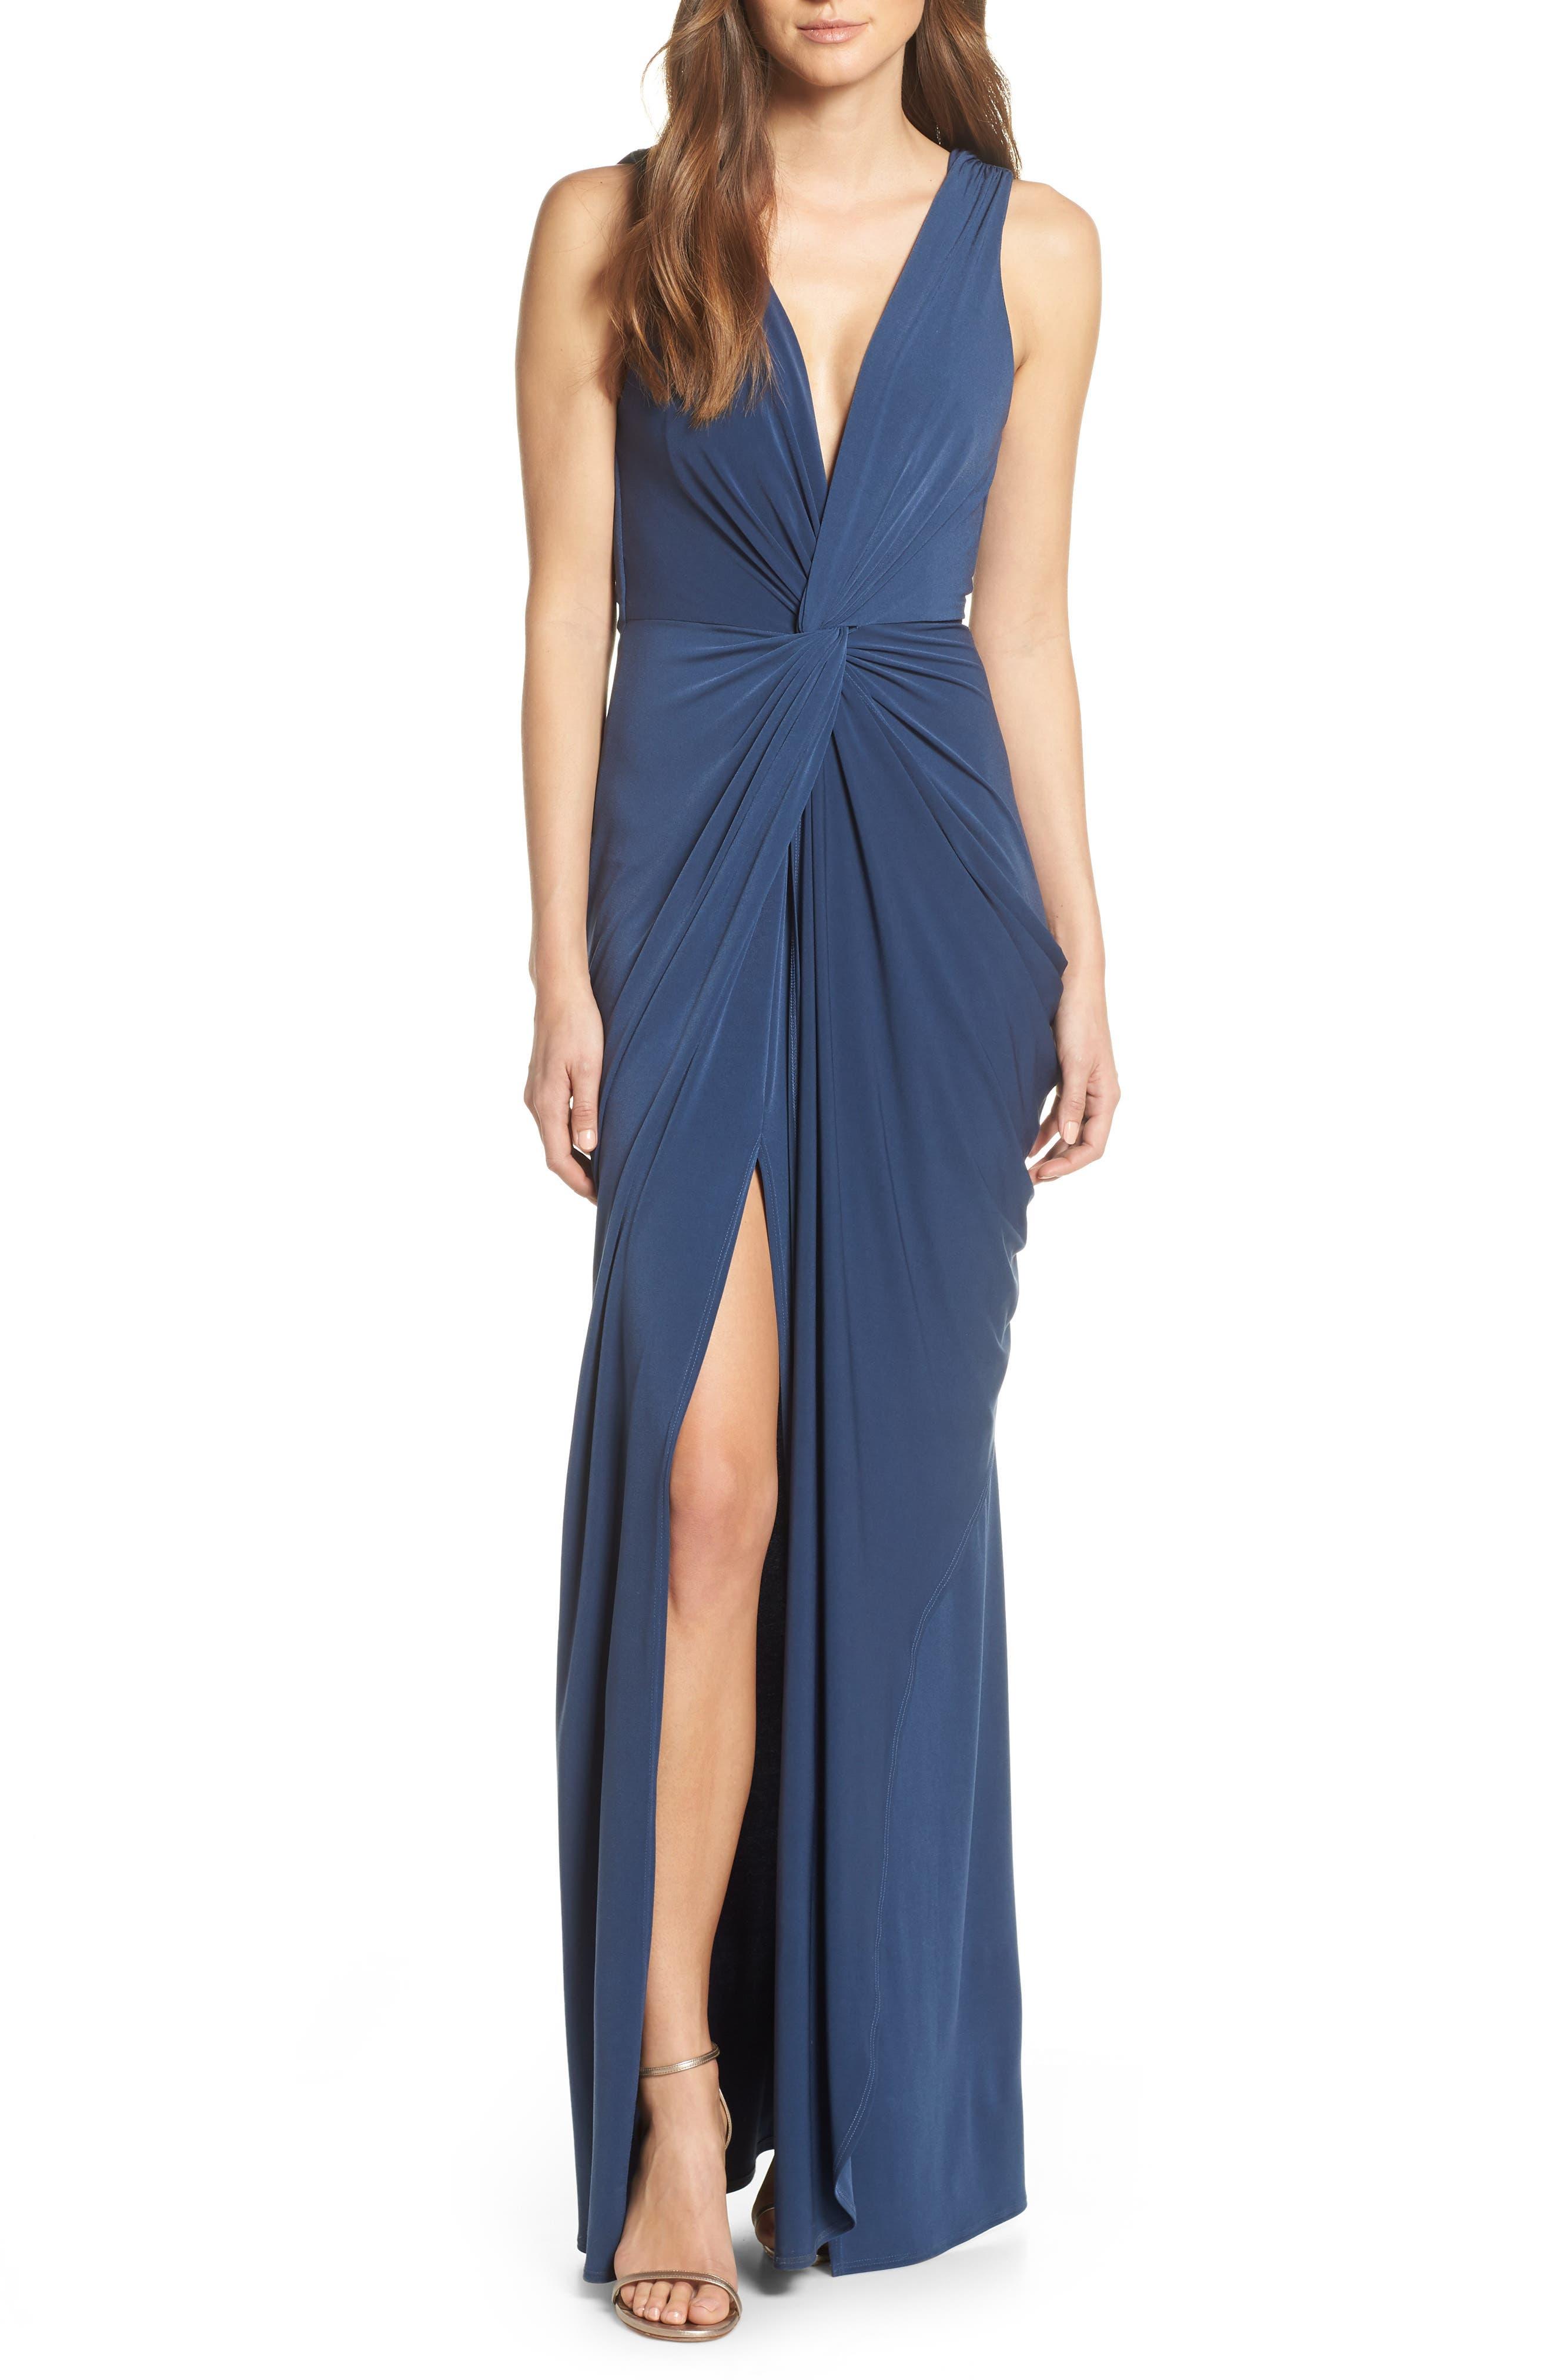 KATIE MAY Leo Twist Front Evening Dress, Main, color, DEEP SEA